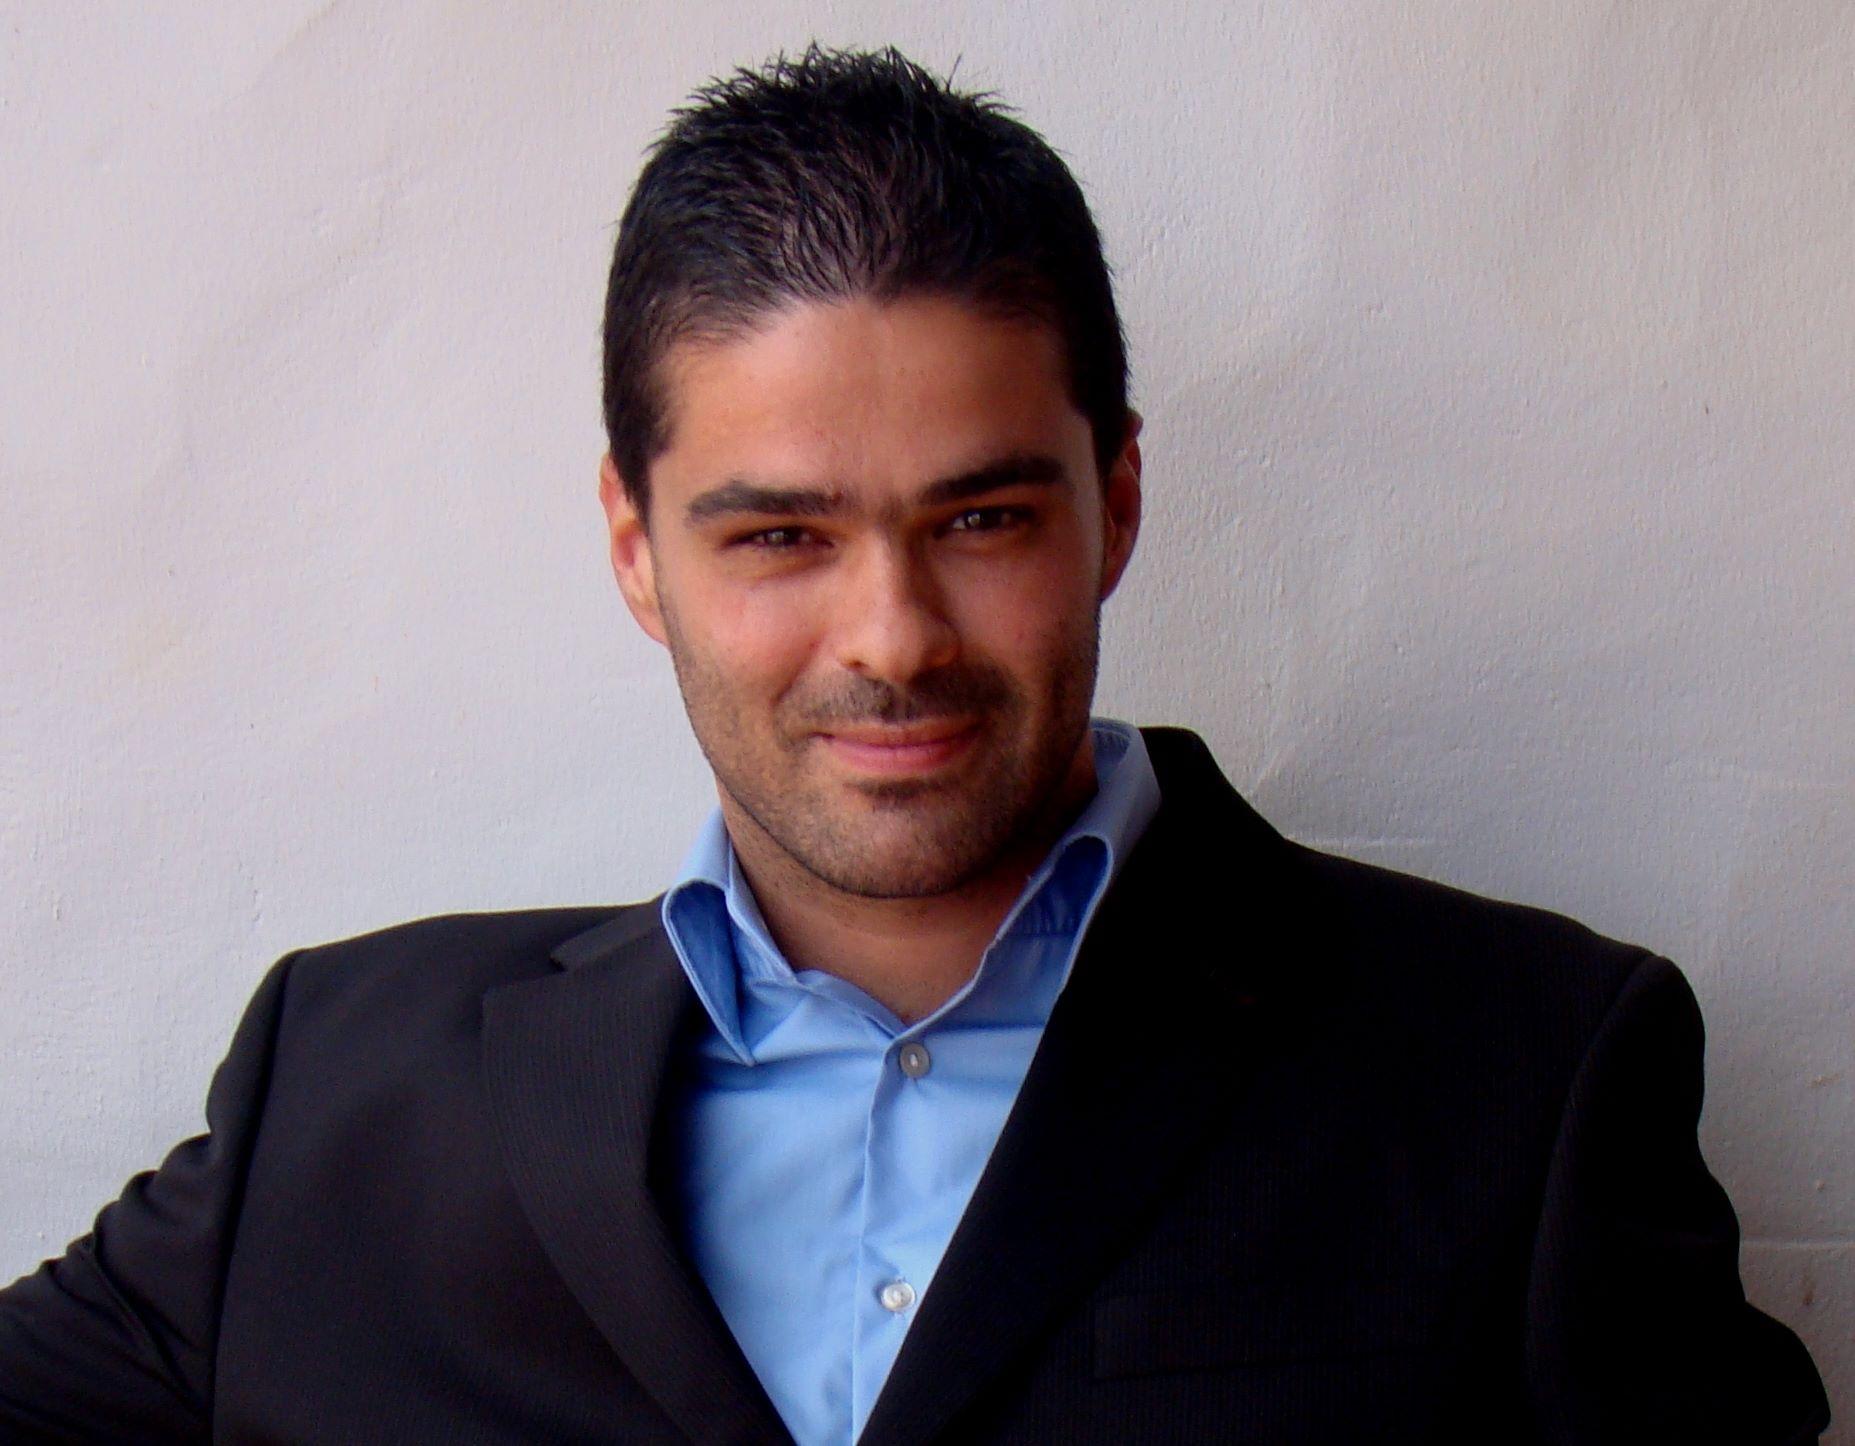 Nuno Alexandre N. Marques